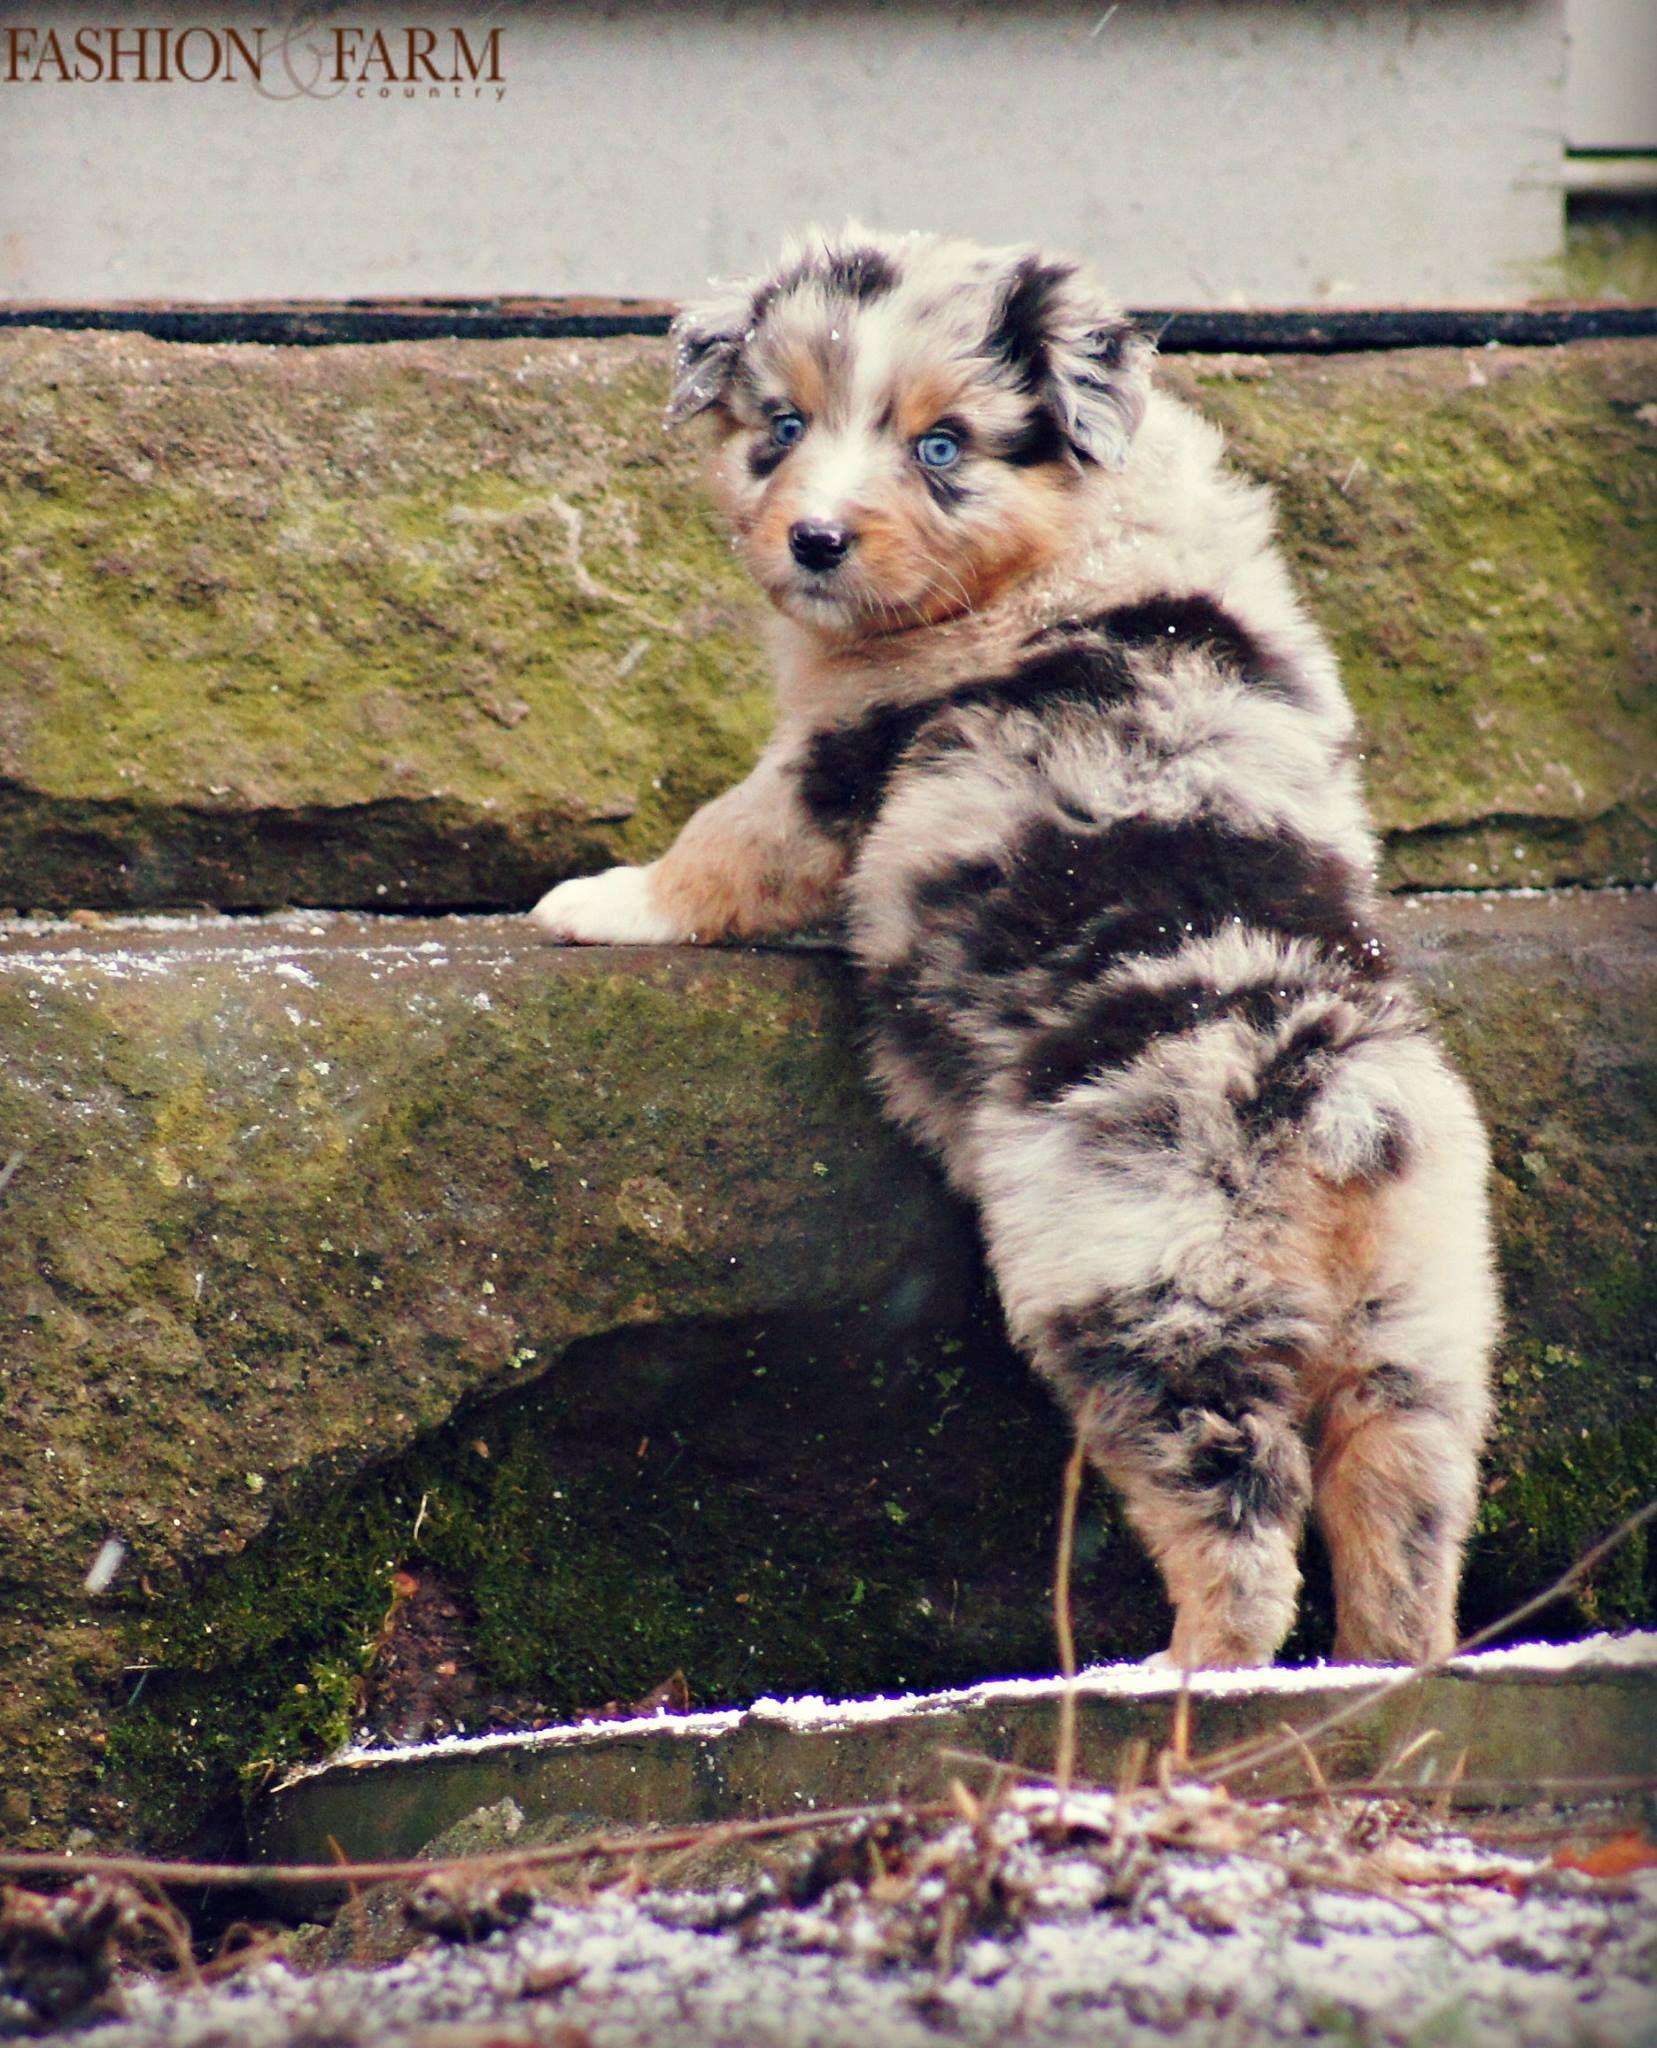 Fashion & Farm Country Australian Shepherd puppy River